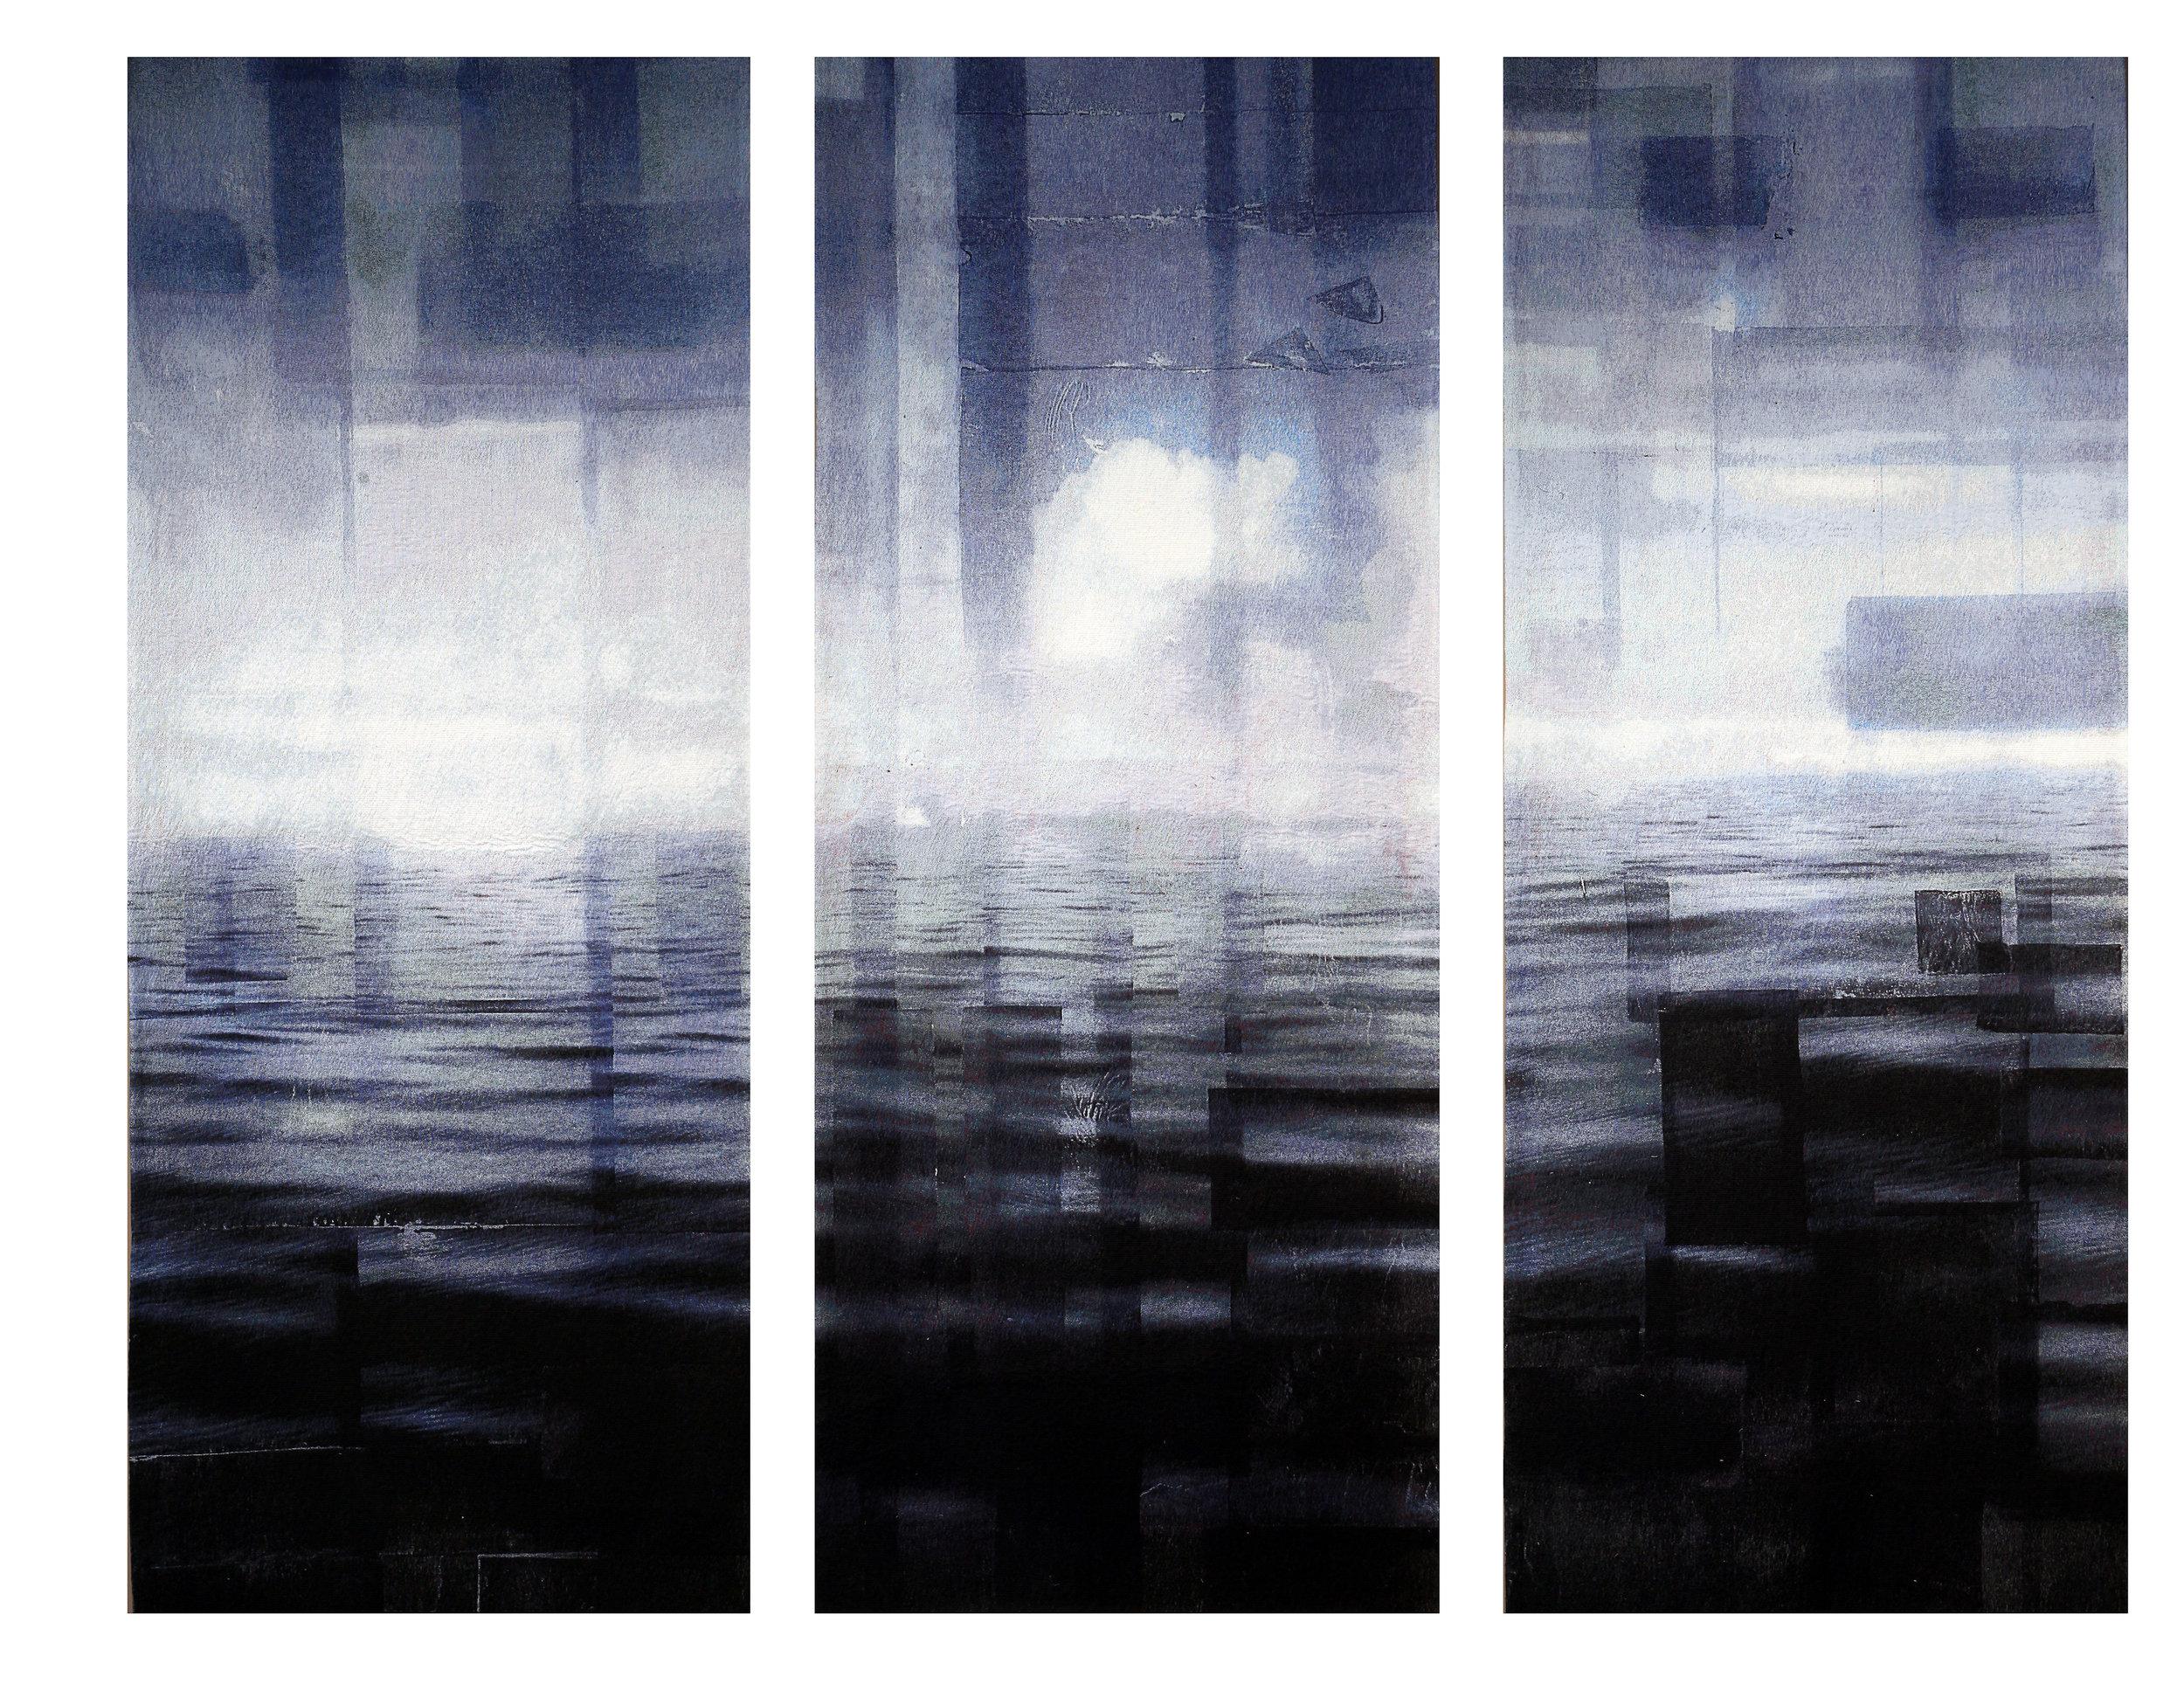 PF.Tapestry.SplitSky.ApproachingStorm.Mallorca.3x.HighRez.mallorca.jpg